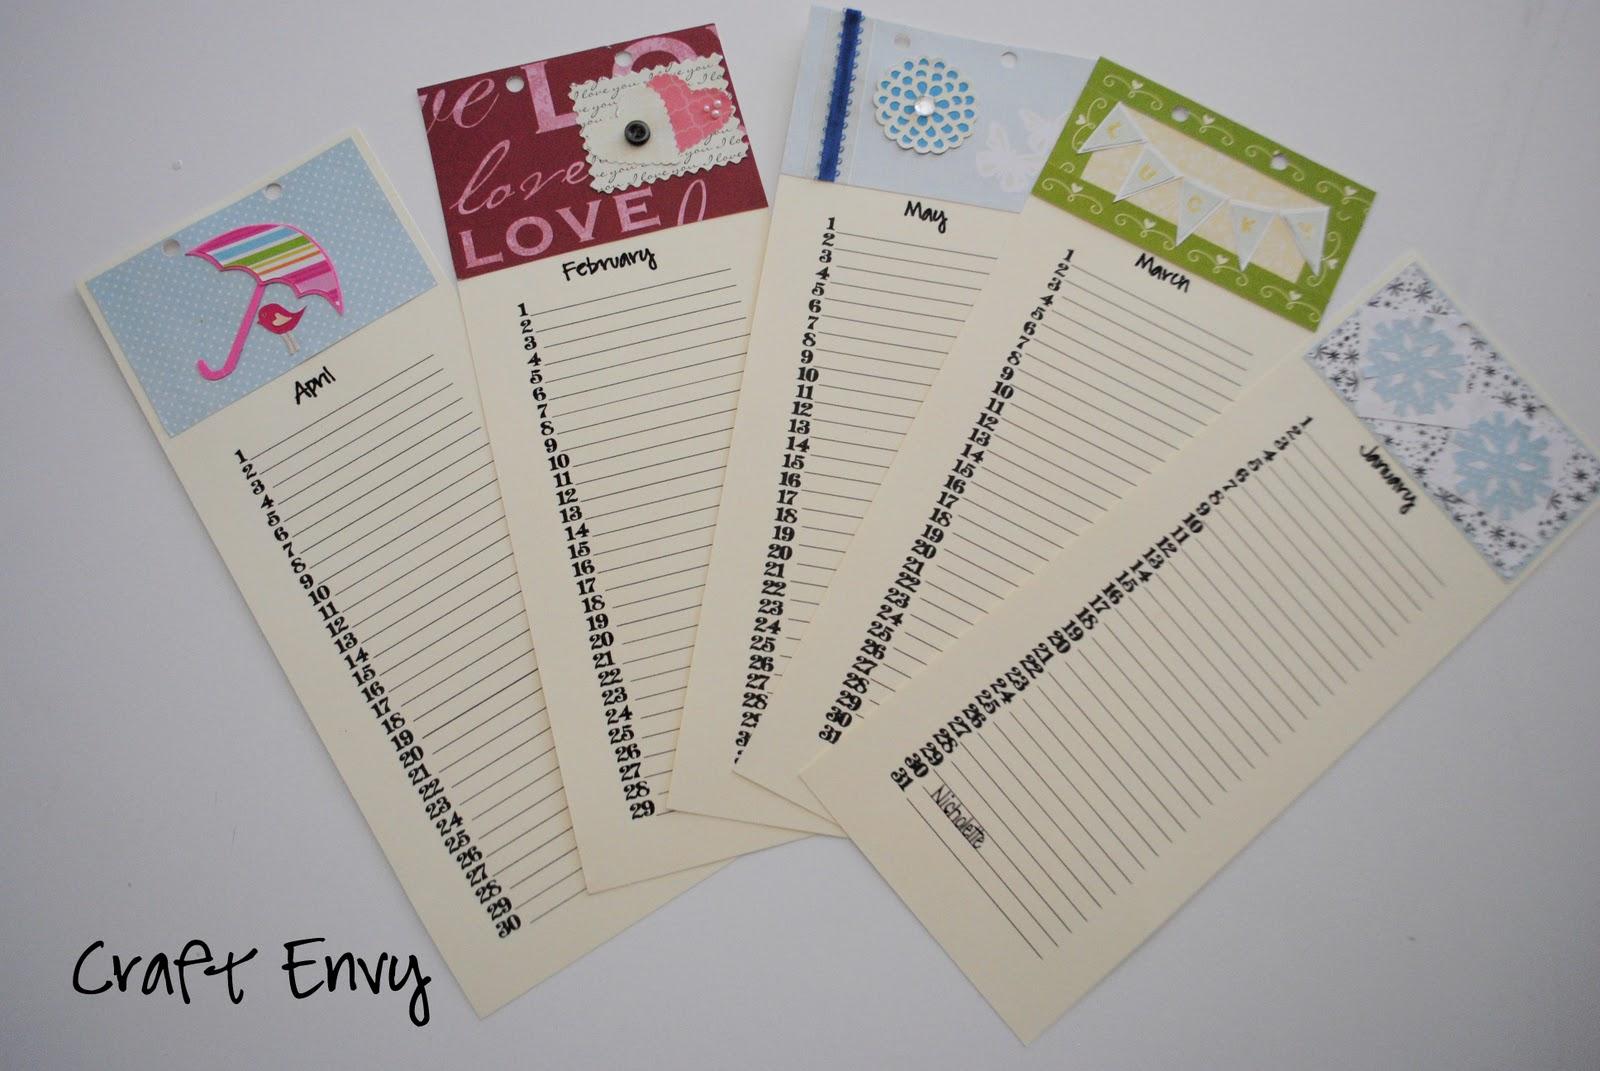 Diy Birthday Calendar : Craft envy diy birthday calendar